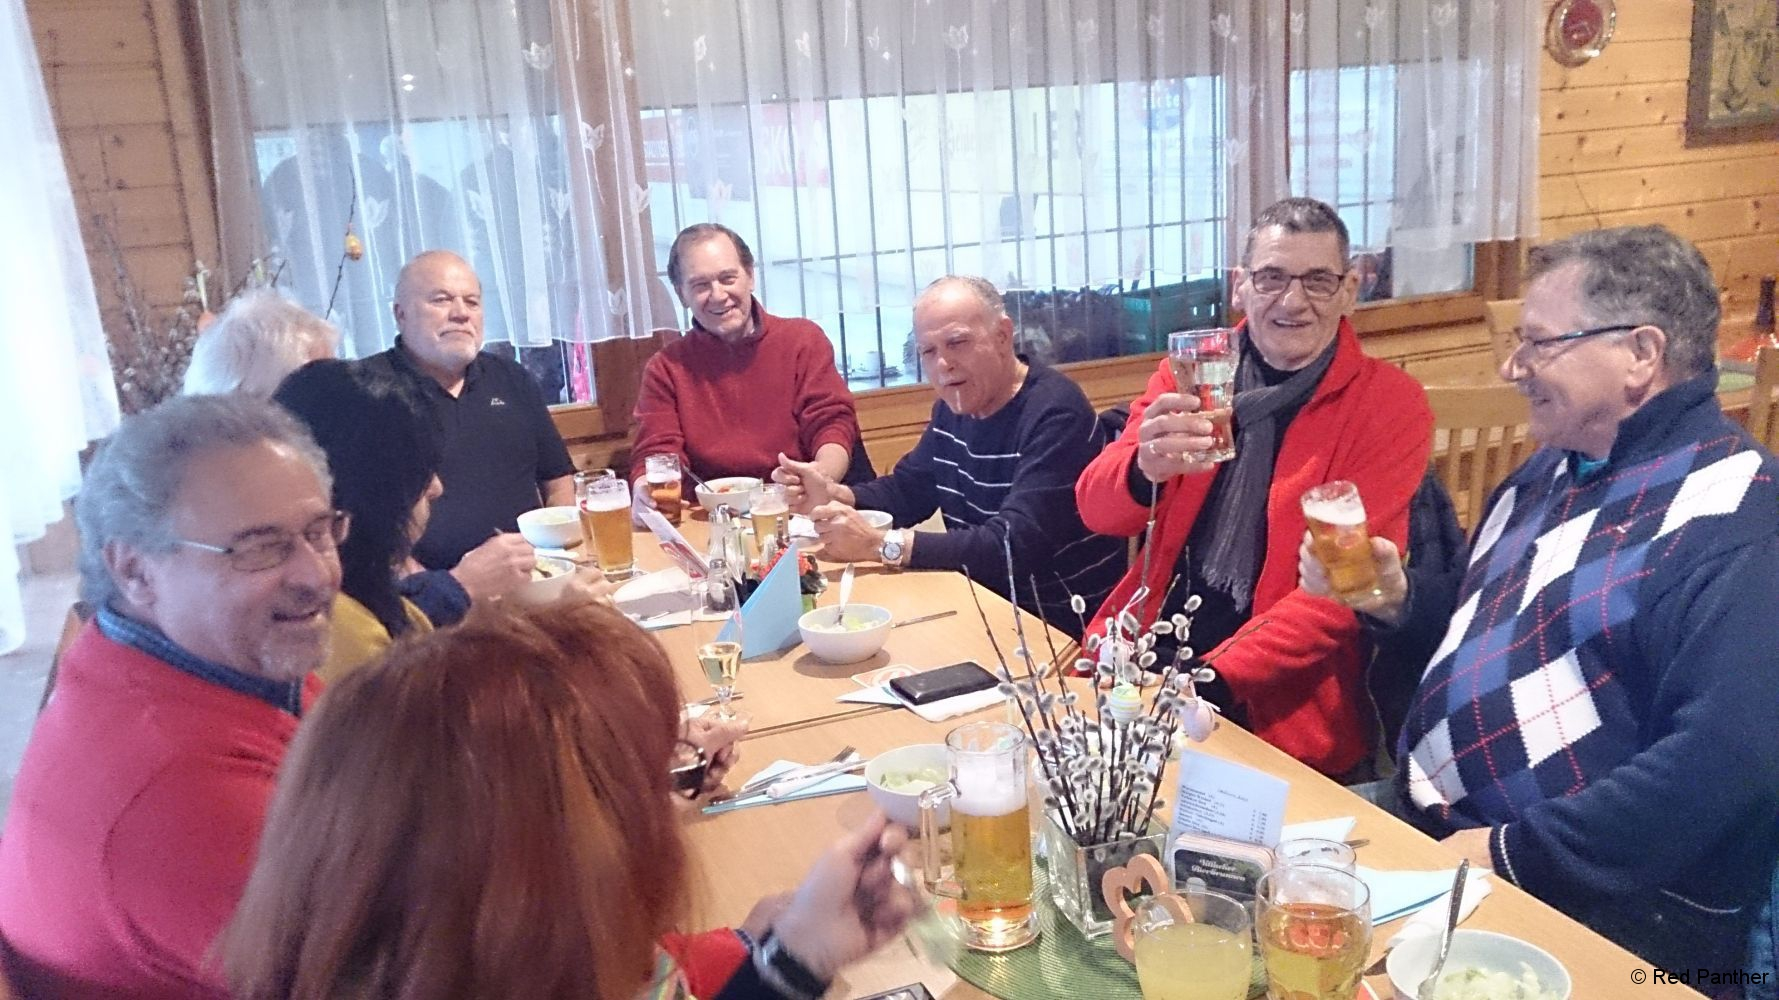 Red-Panther-Eisstockschießen-Abschluß-2016-006.jpg